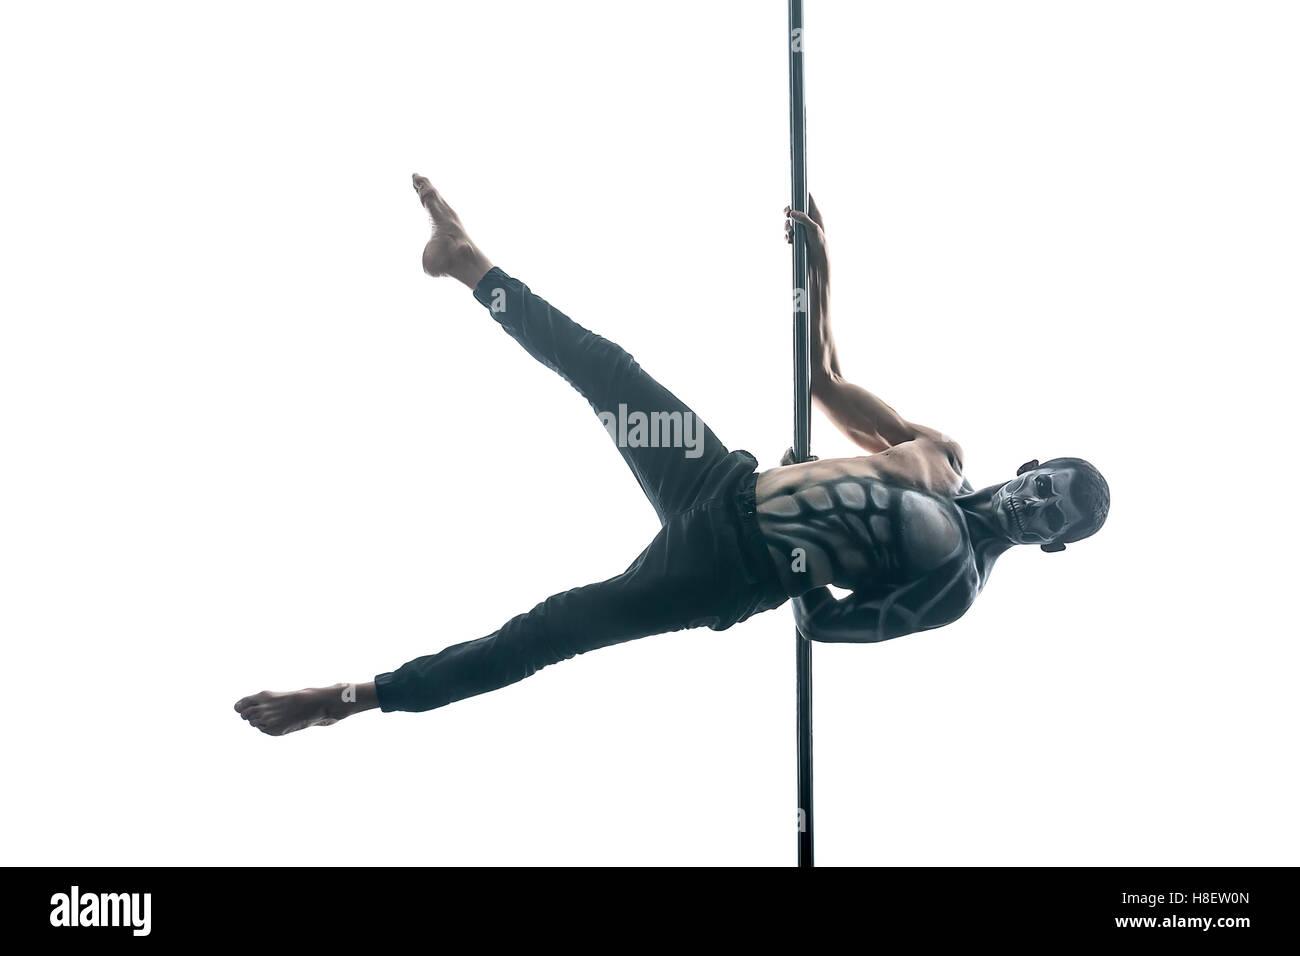 Male pole dancer with body-art on pylon - Stock Image